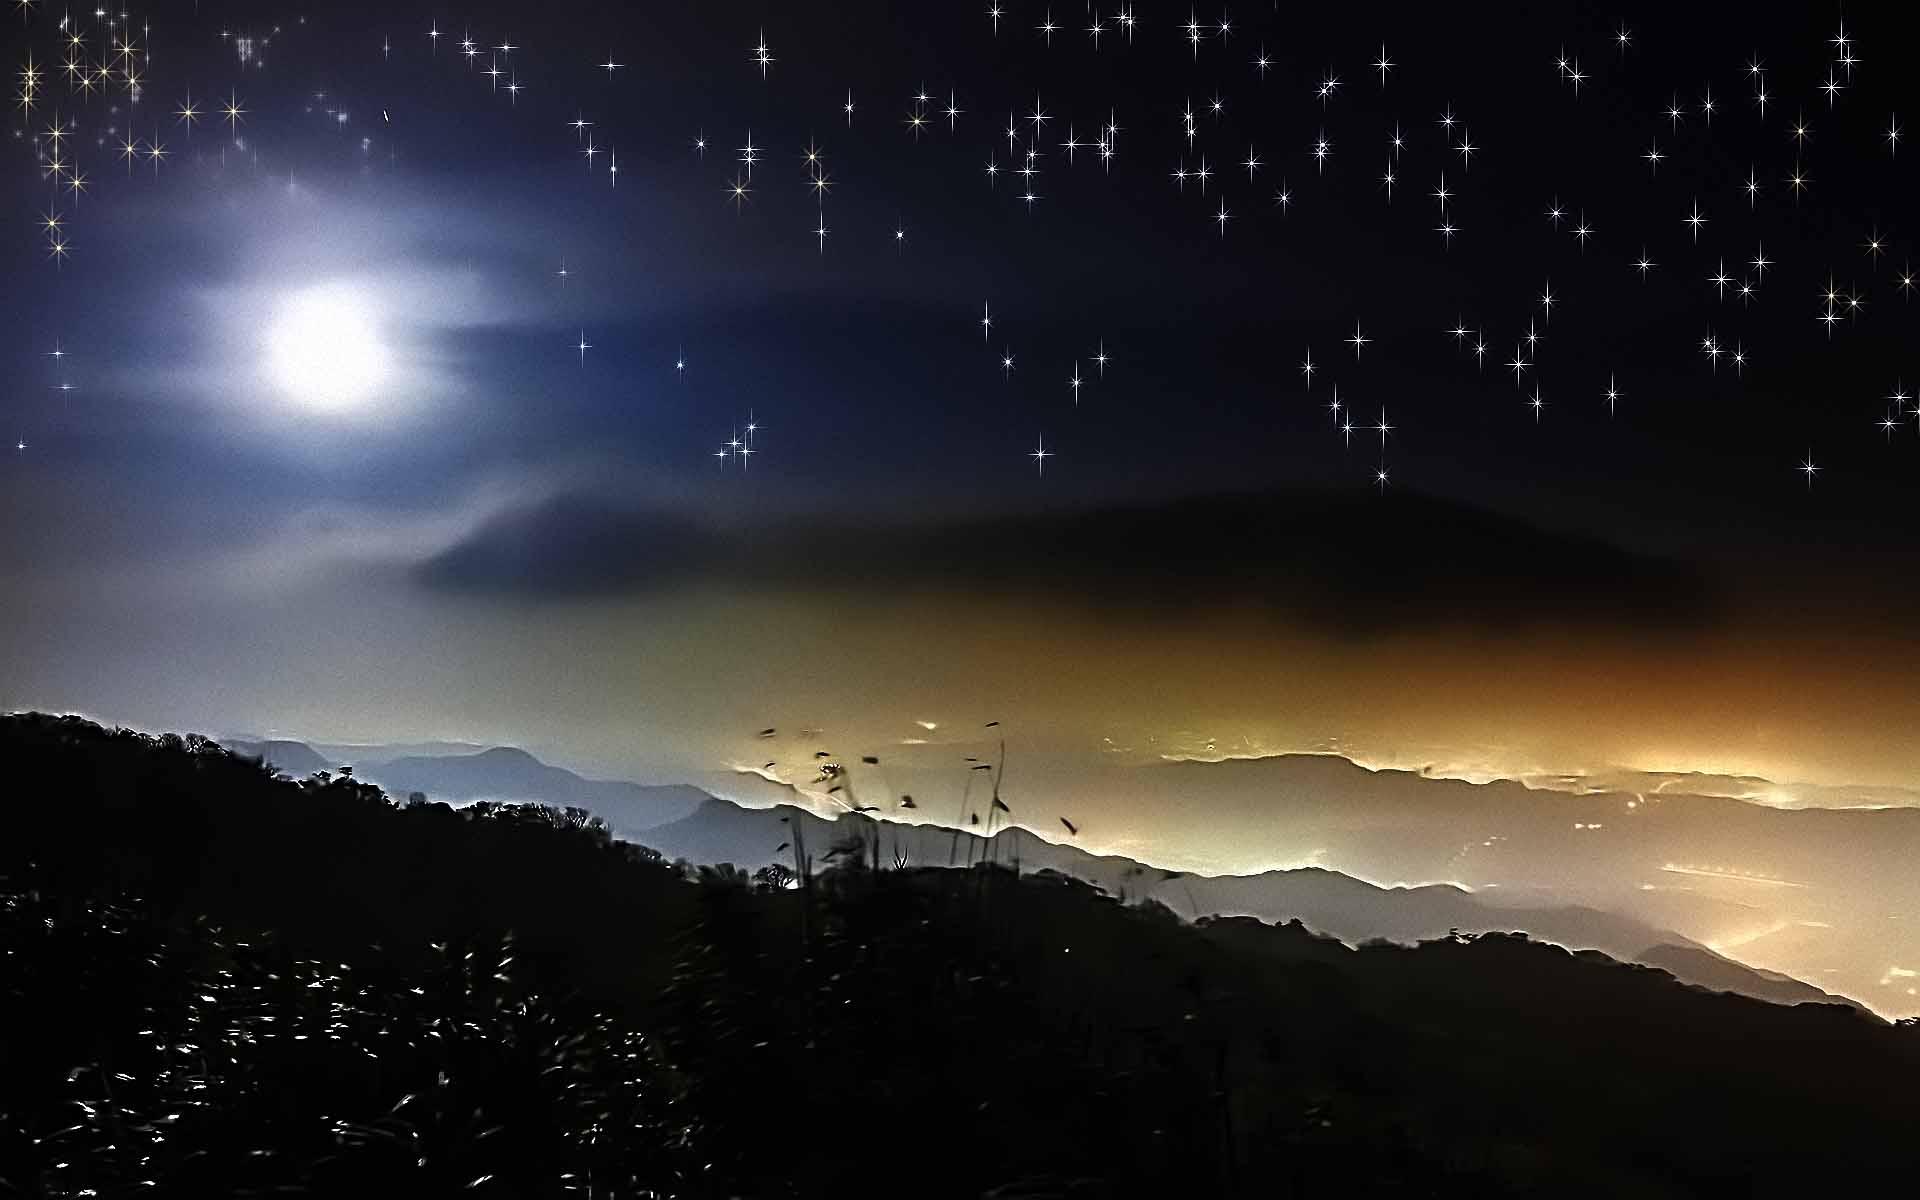 Starry Night Sky Wallpapers Top Free Starry Night Sky